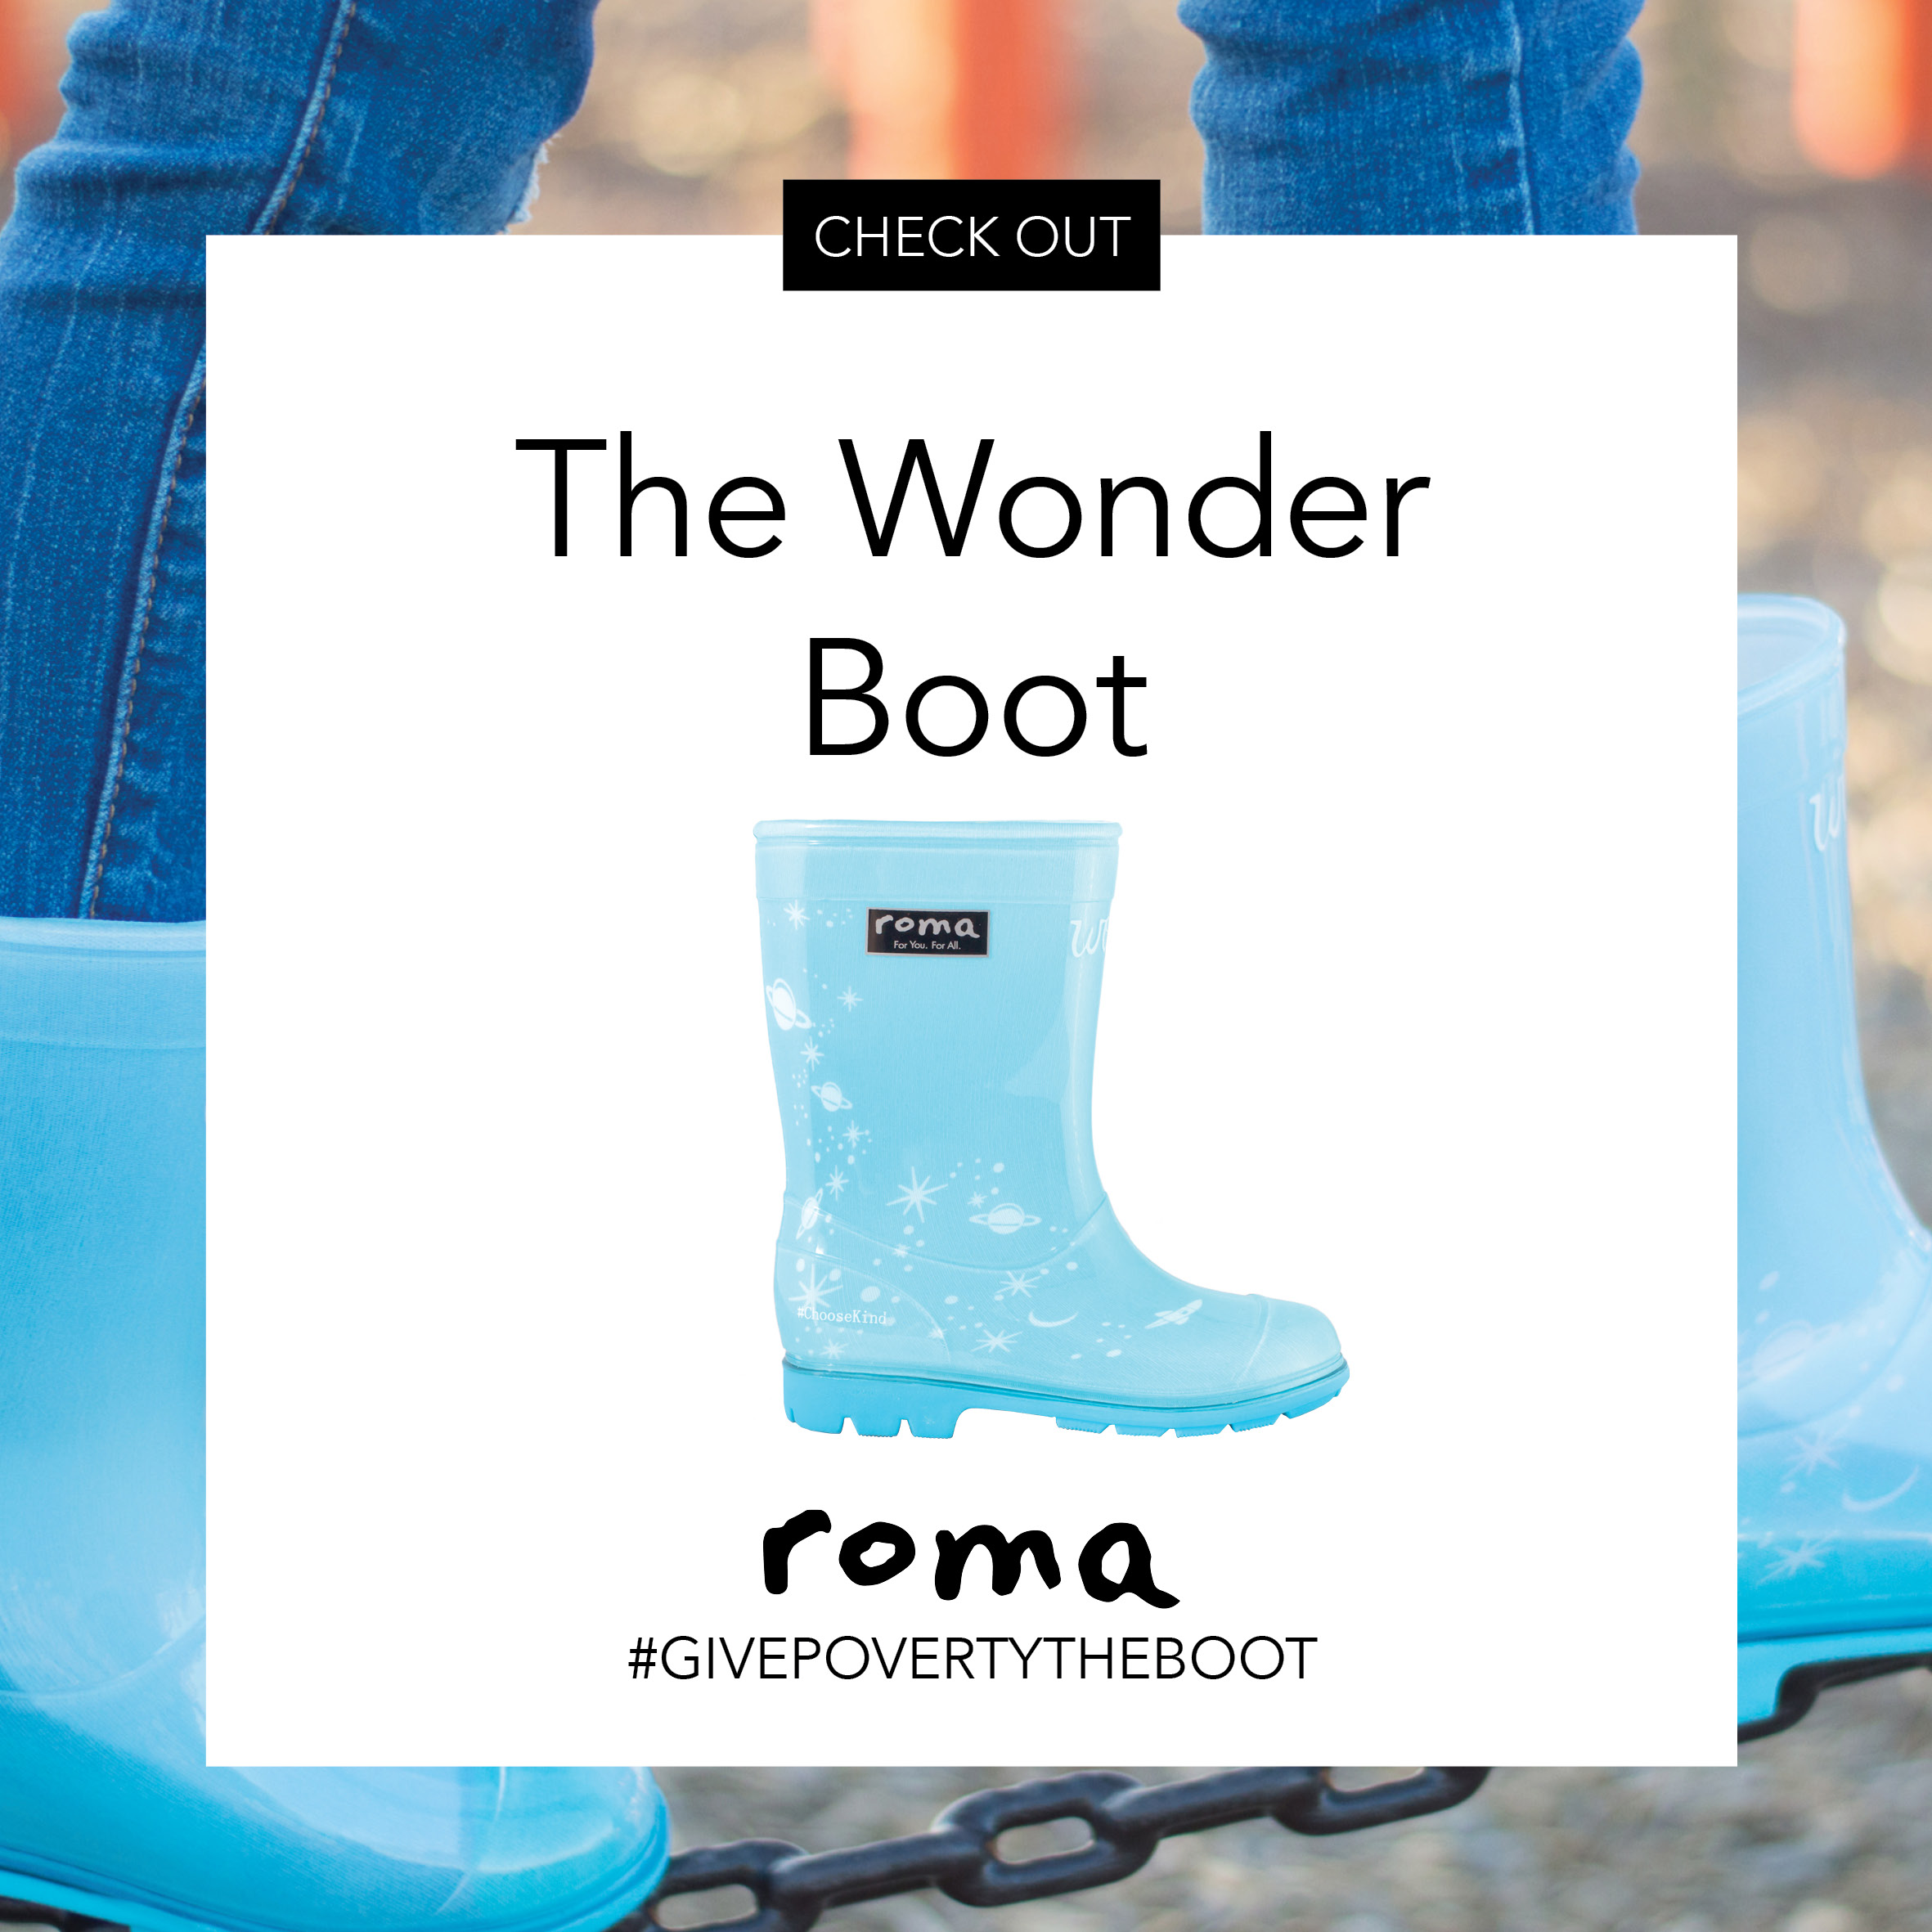 ROMA_boot2.jpg